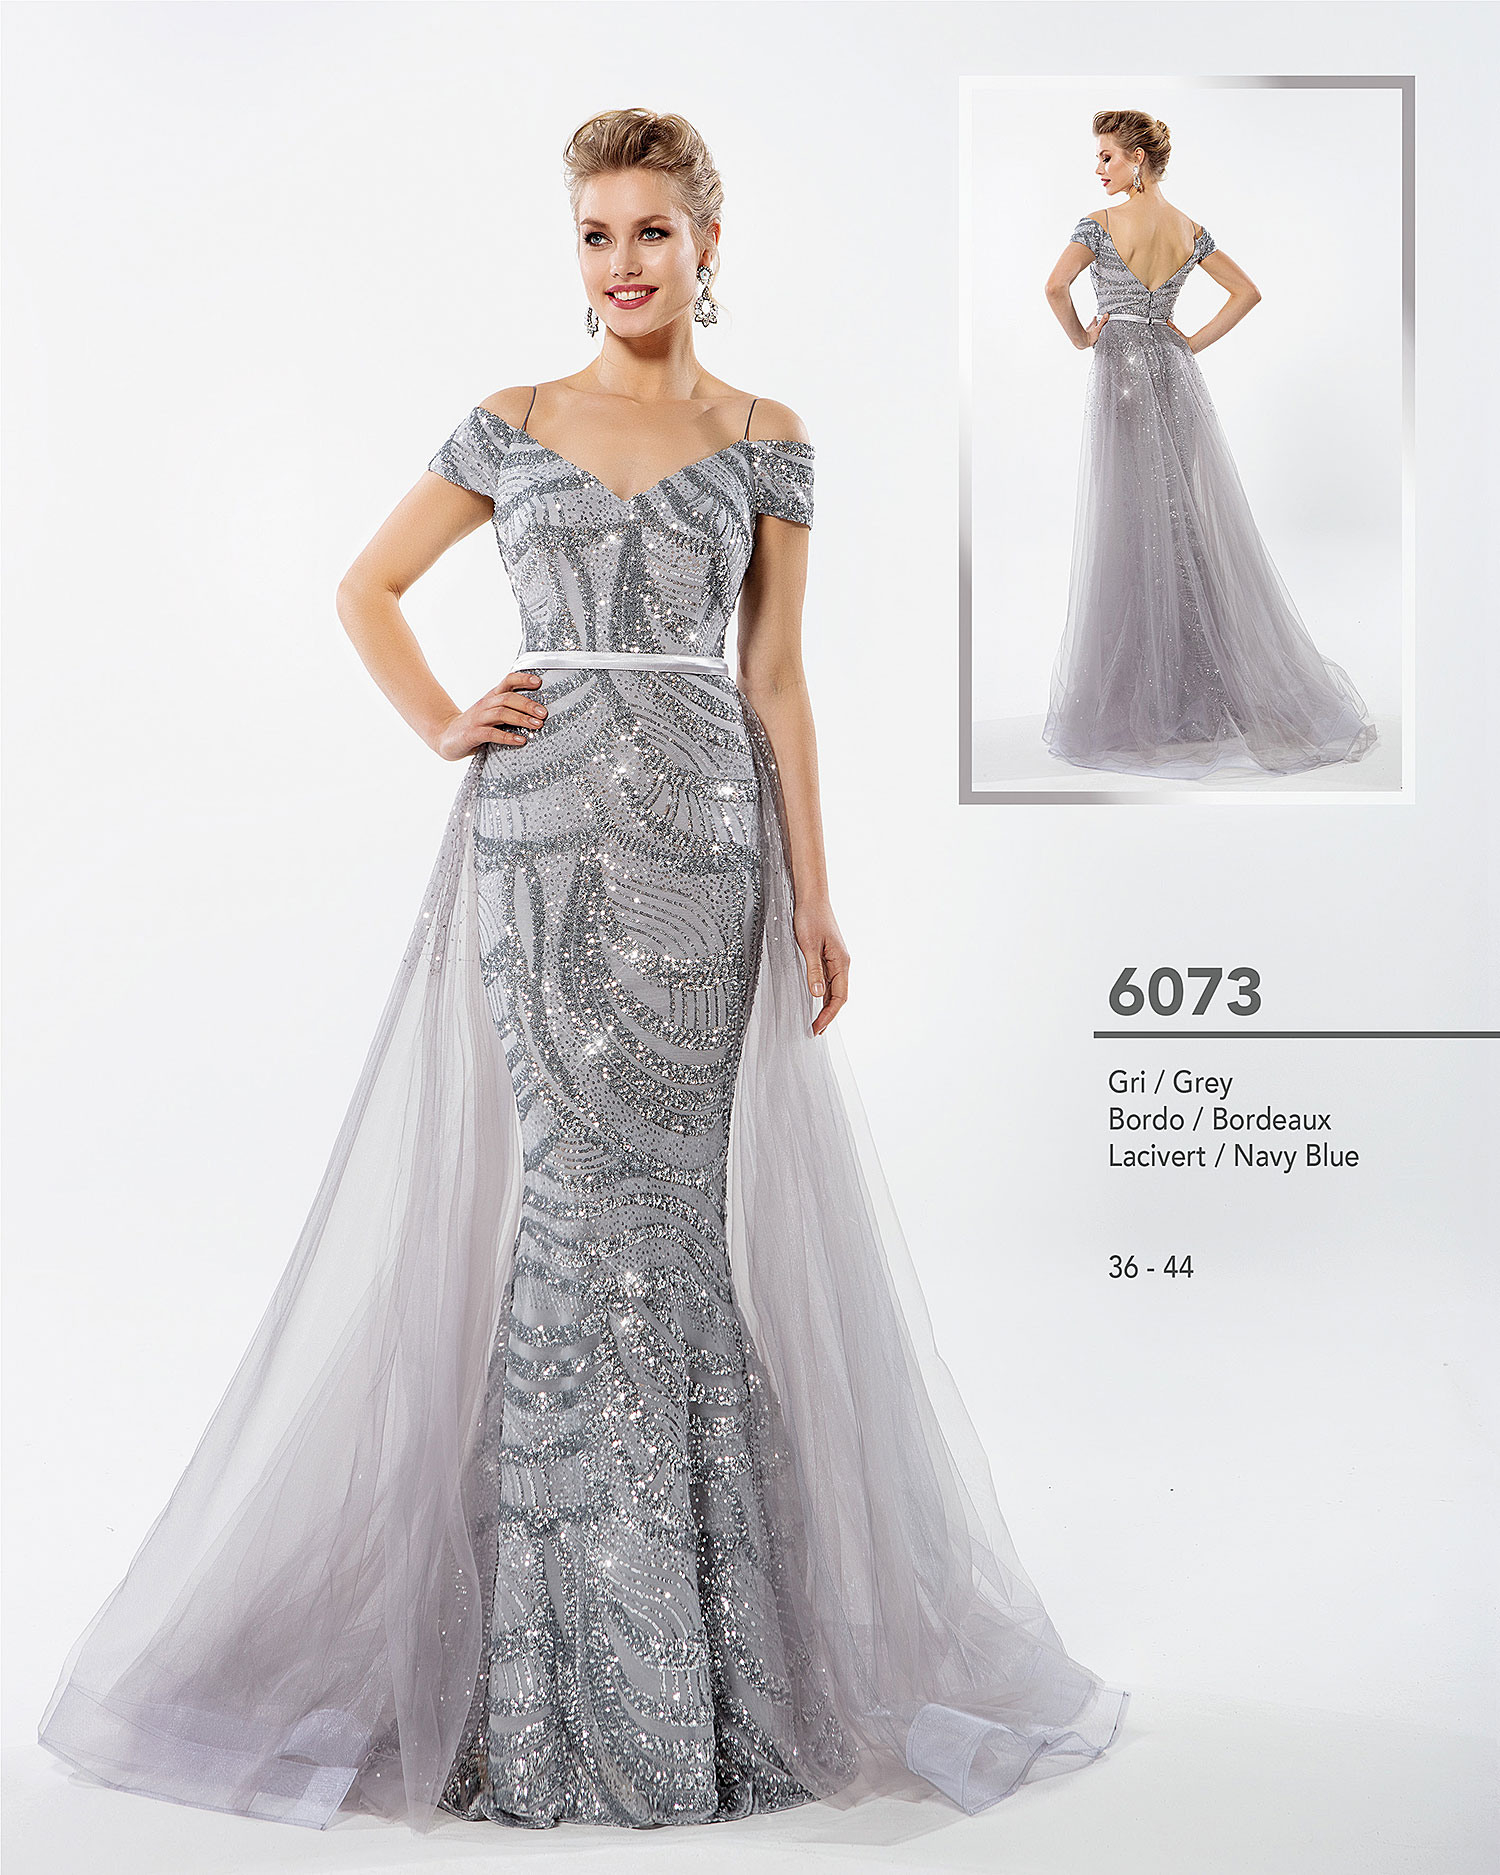 Formal Coolste Abendkleider Katalog Bestellen Spezialgebiet13 Elegant Abendkleider Katalog Bestellen Design